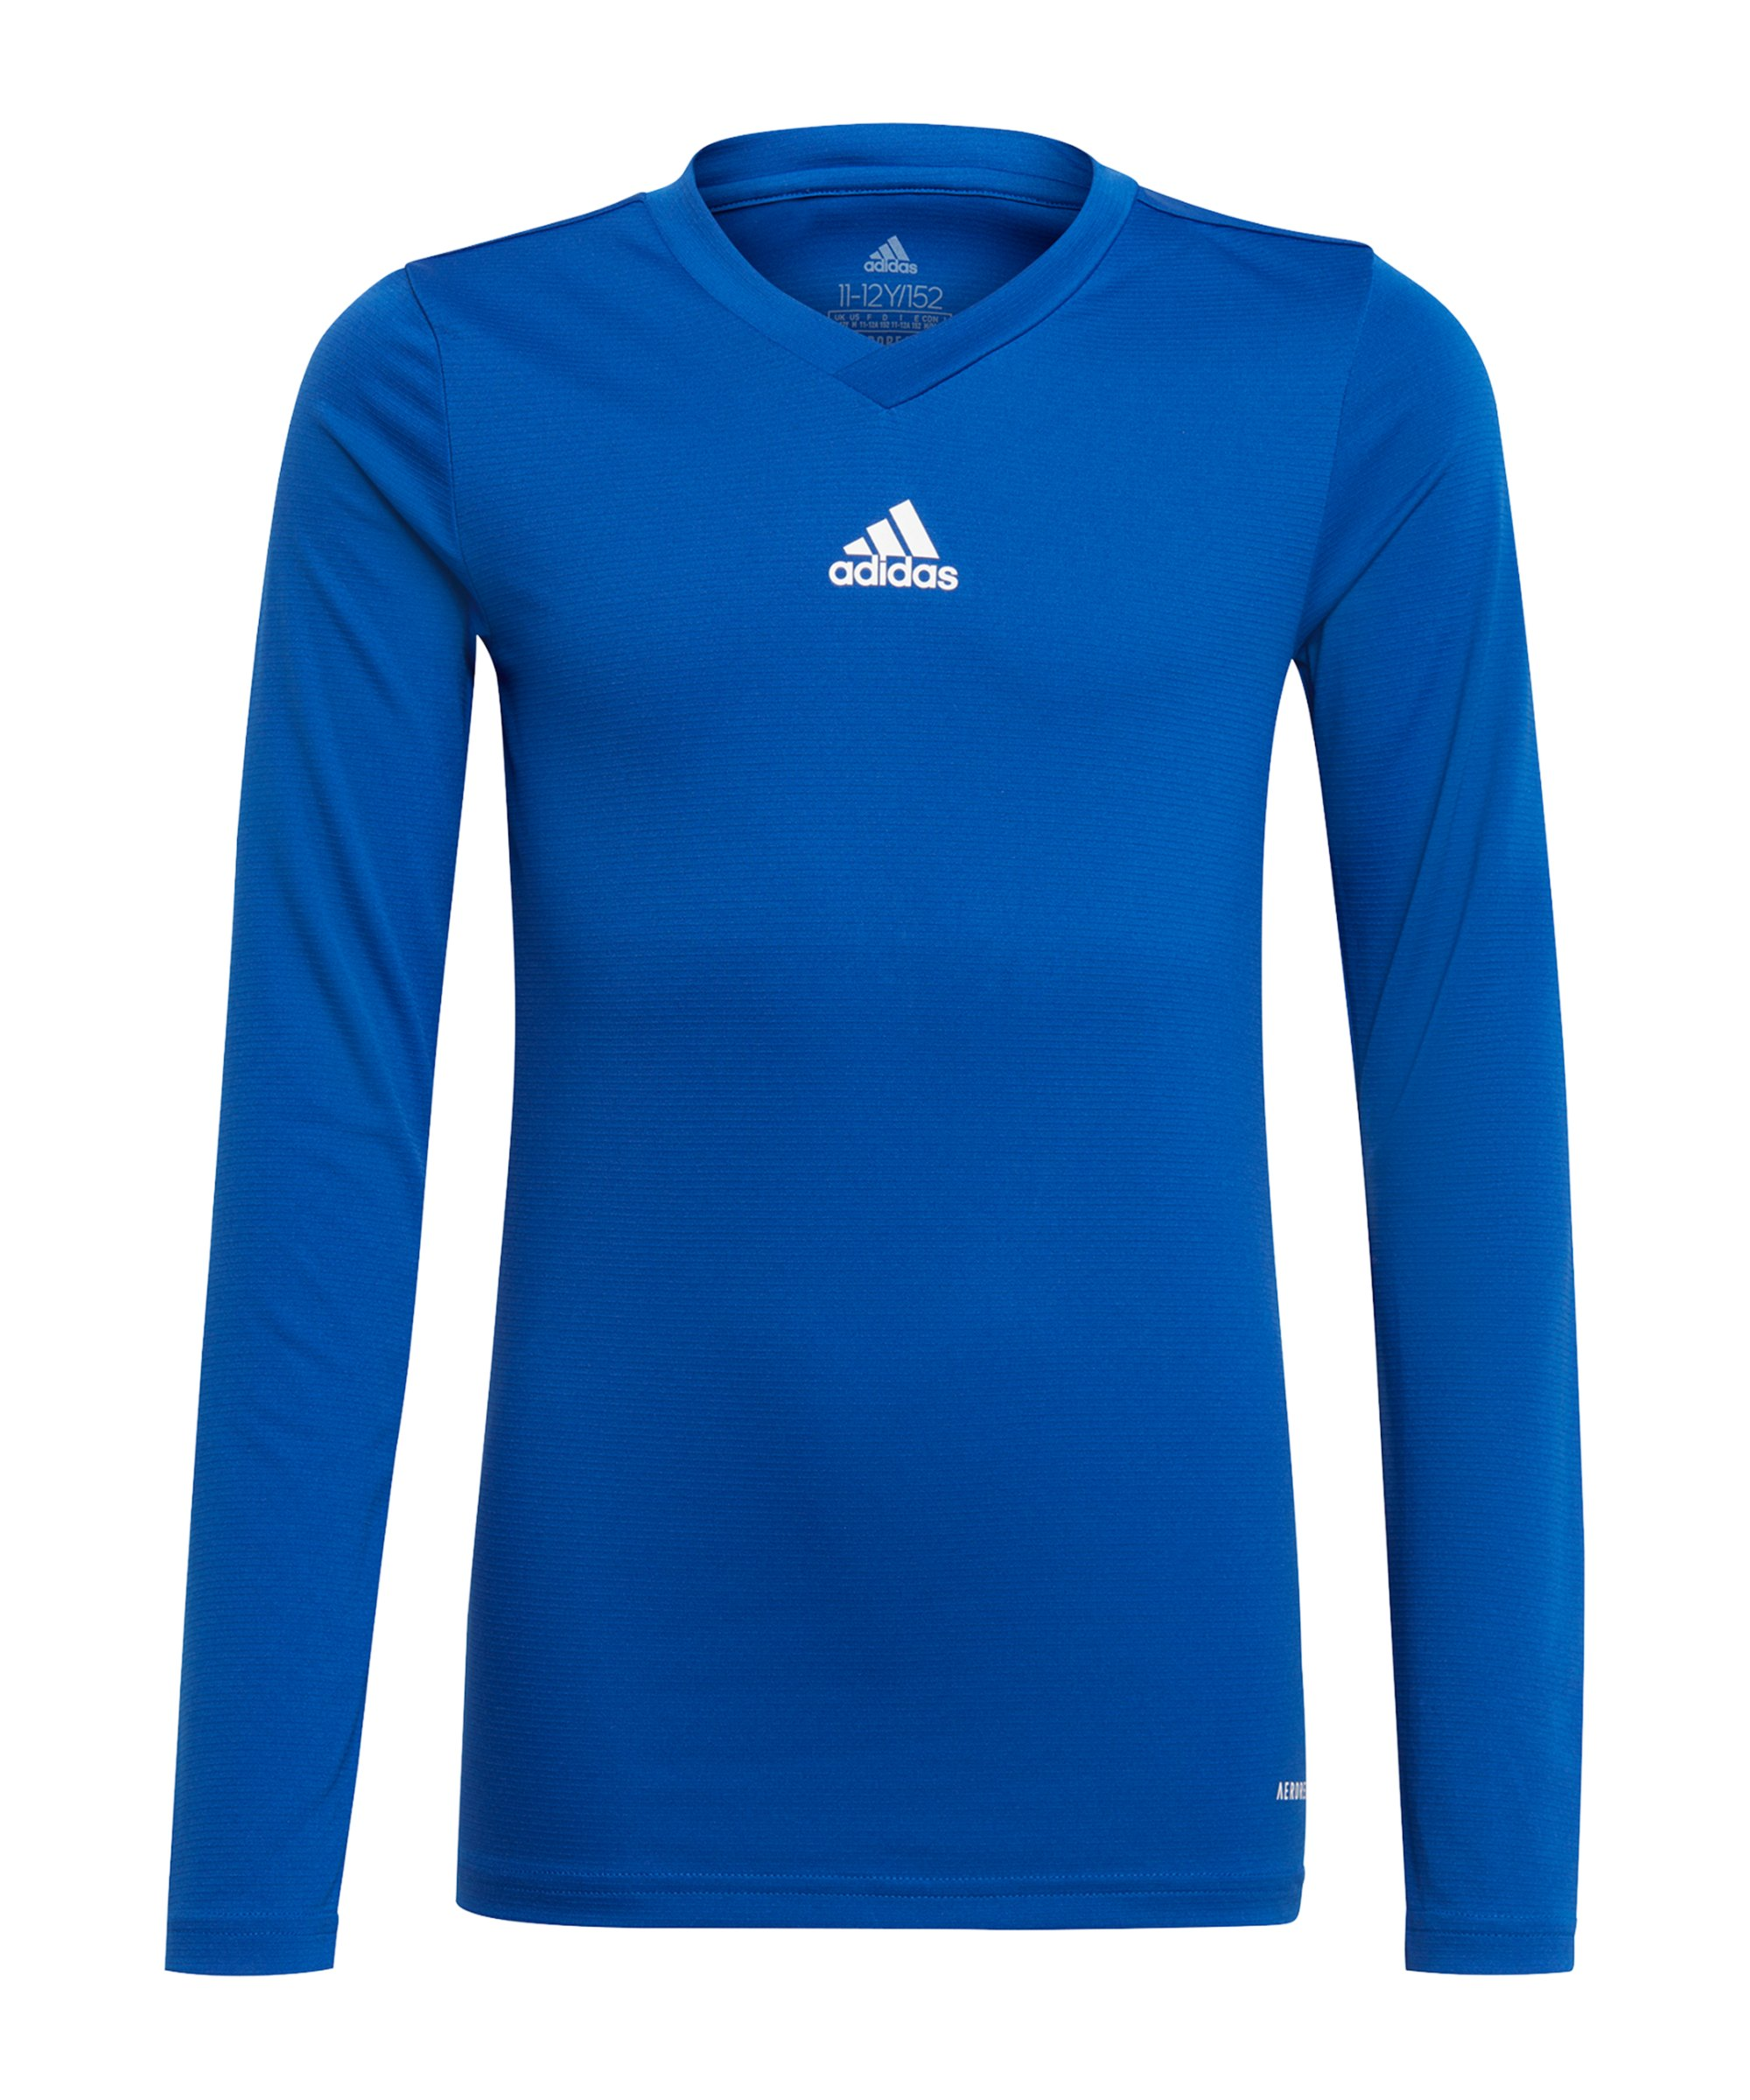 adidas Team Base Top langarm Kids Blau Weiss - blau